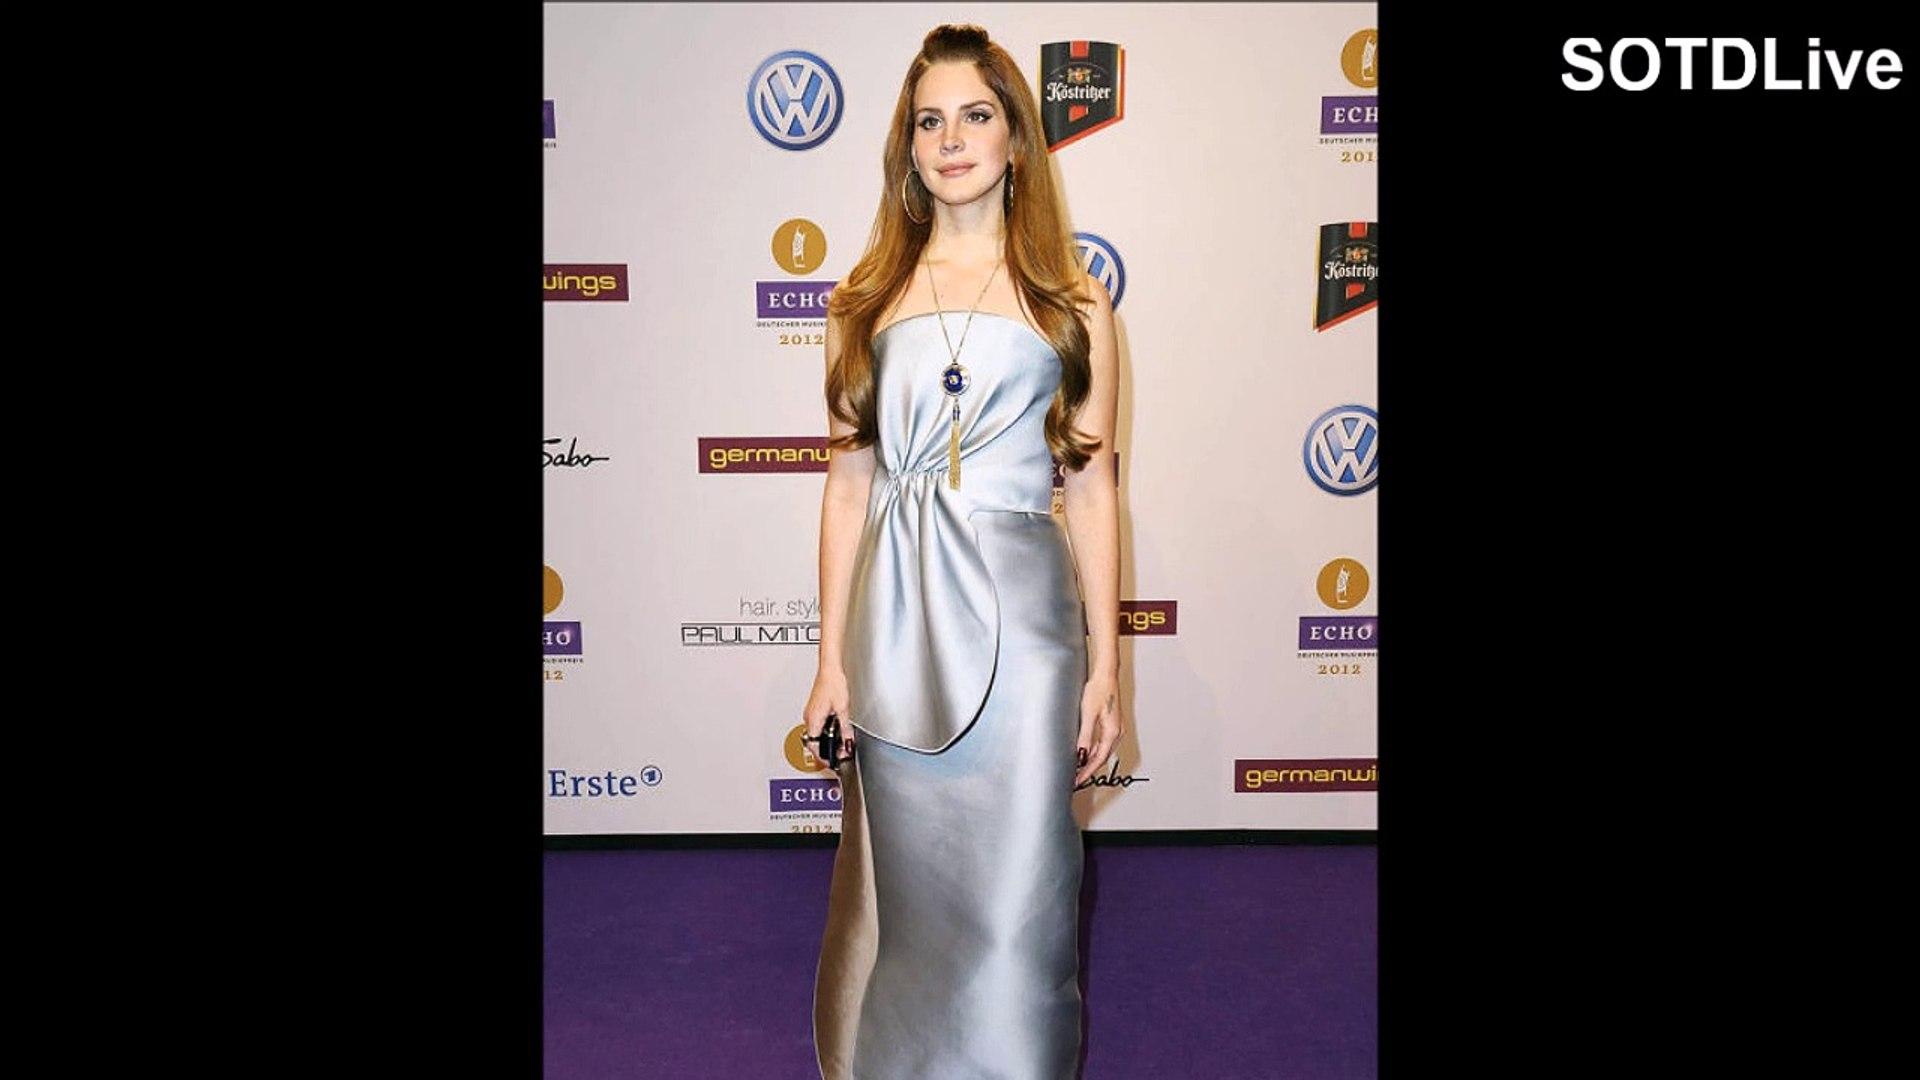 LANA DEL REY looks RAVISHING in GREY DRESS | SOTDLive | Episode 6